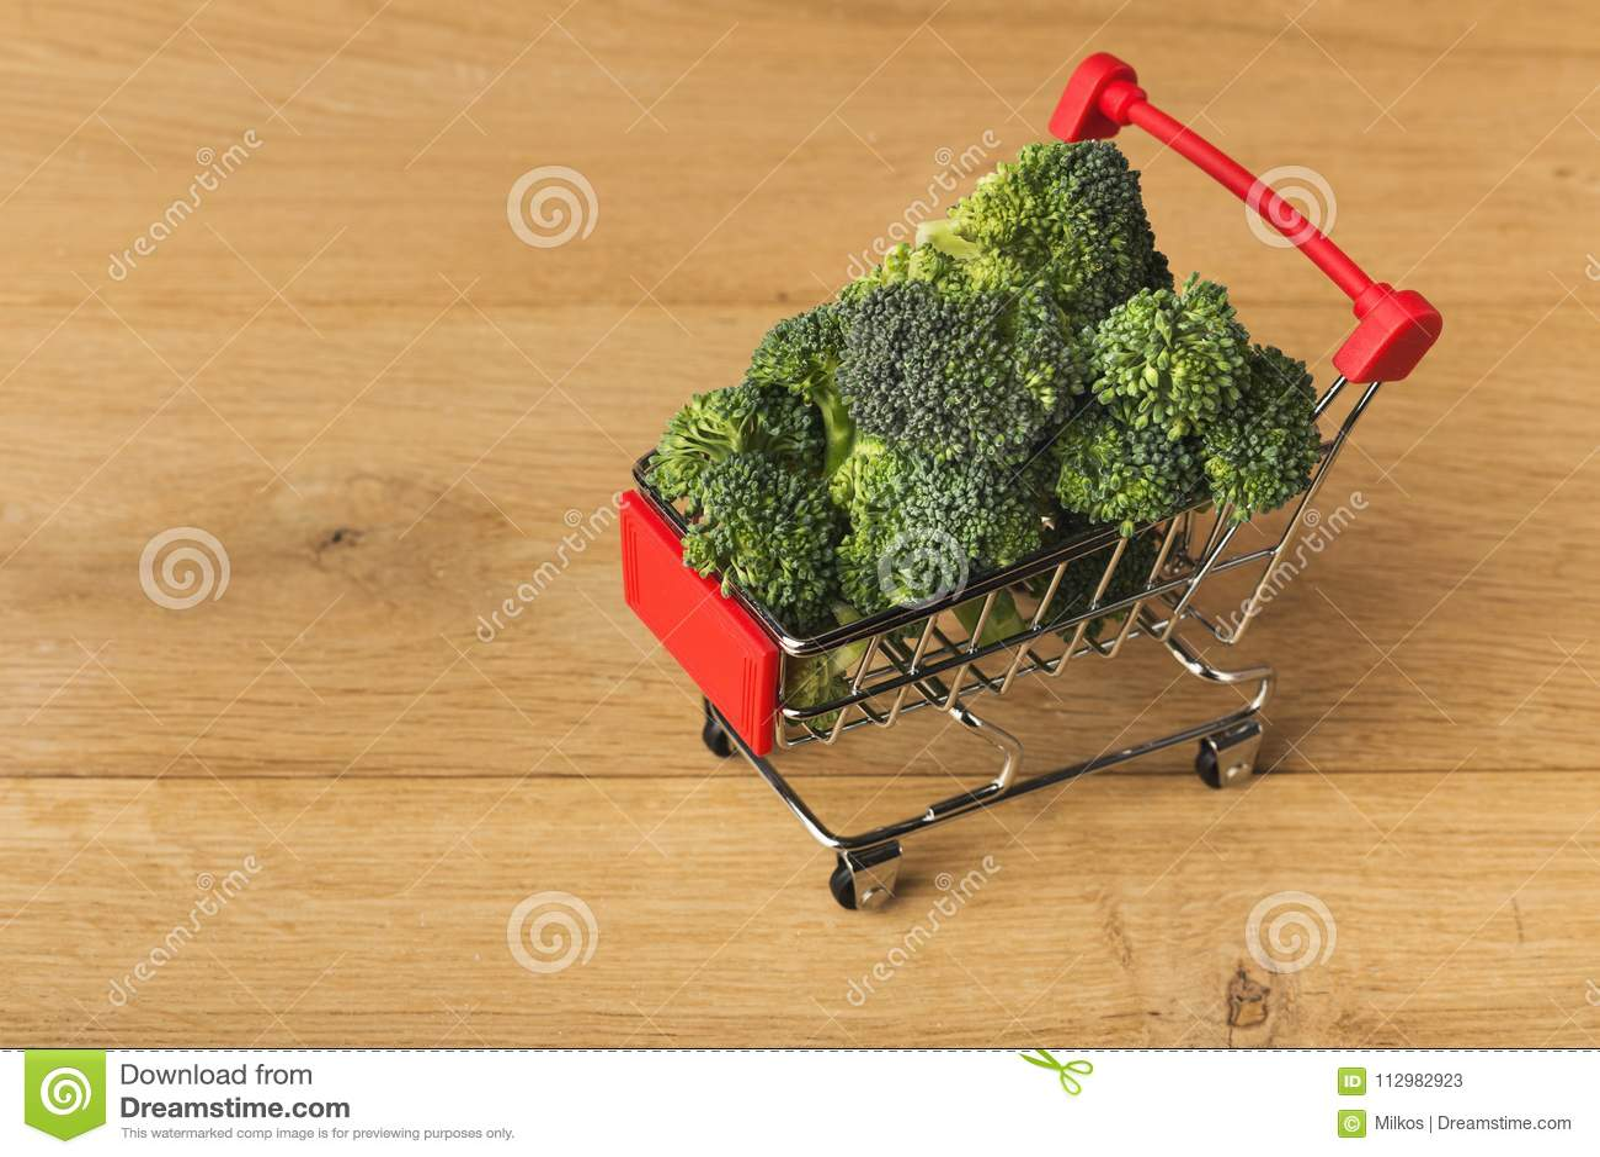 Shopping cart full of broccoli